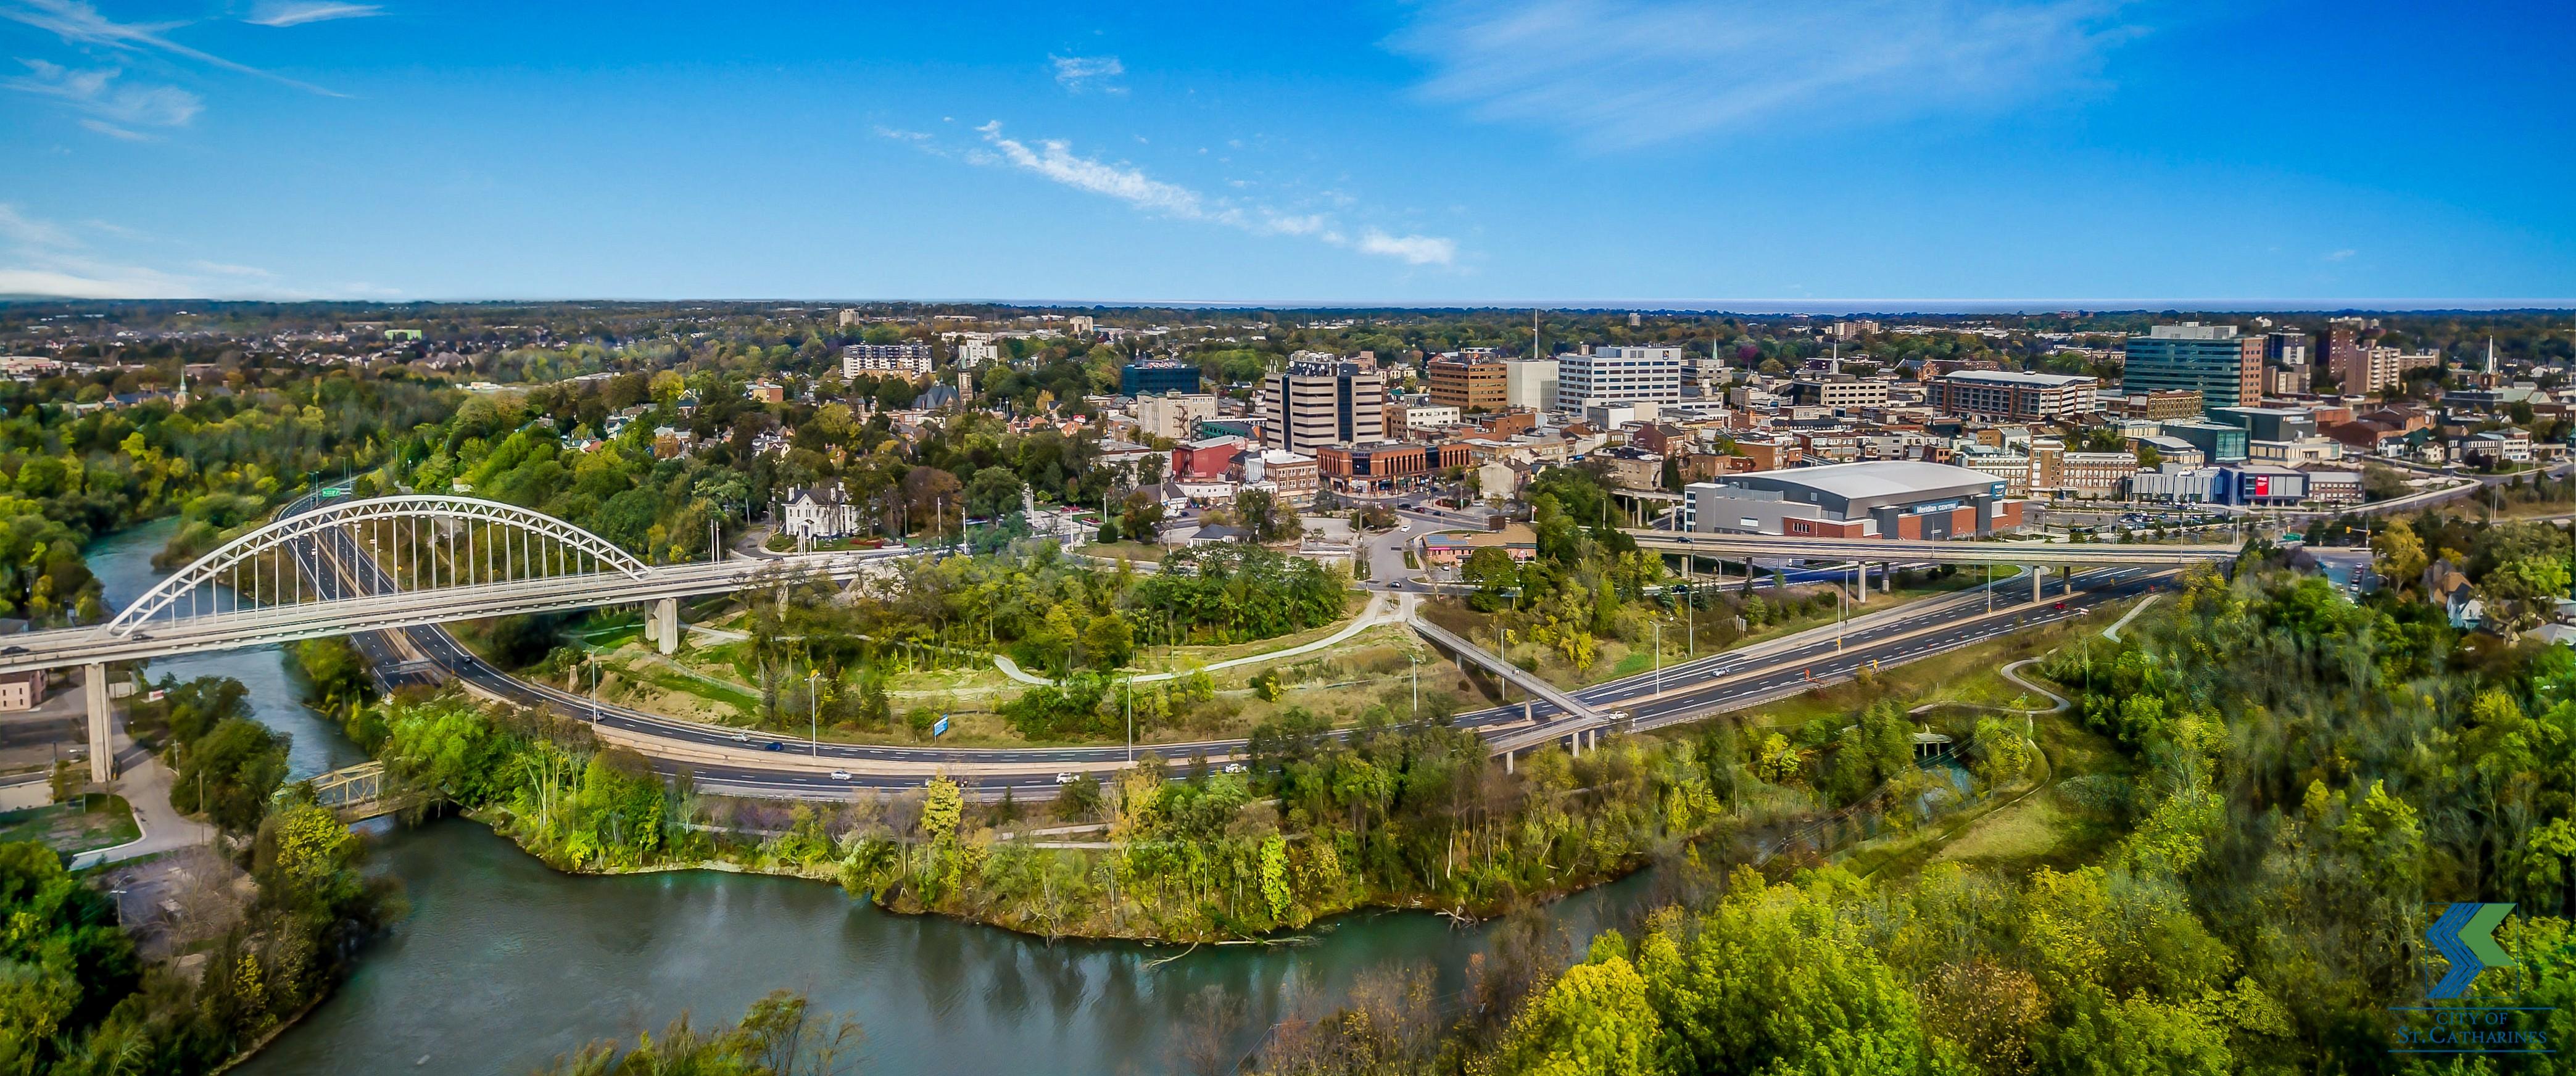 City of St. Catharines | LinkedIn